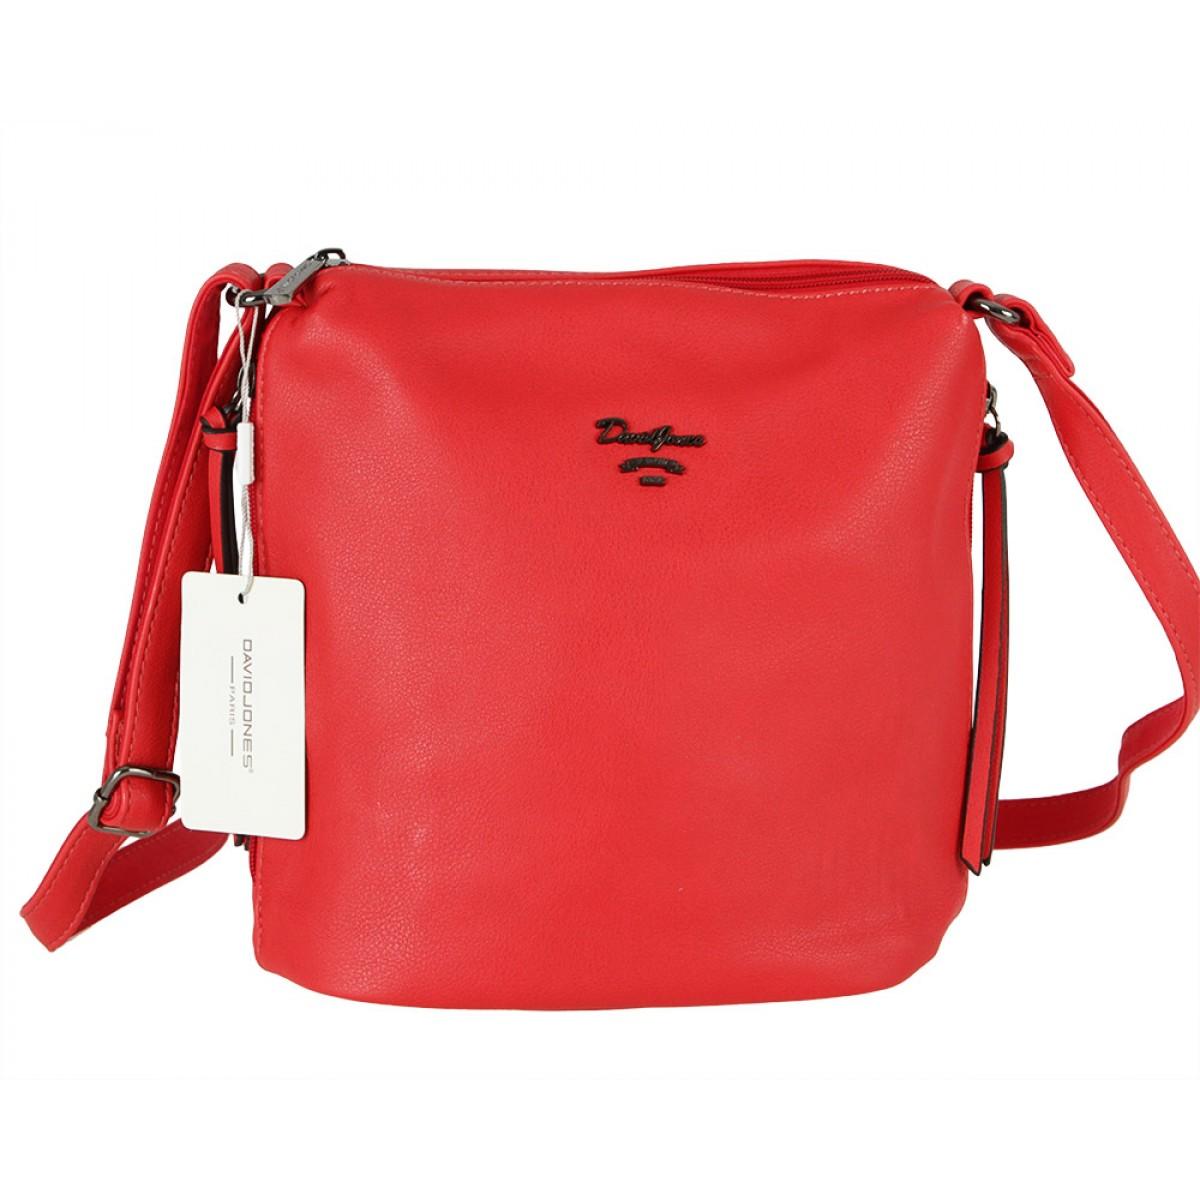 Жіноча сумка David Jones 6202-1A RED